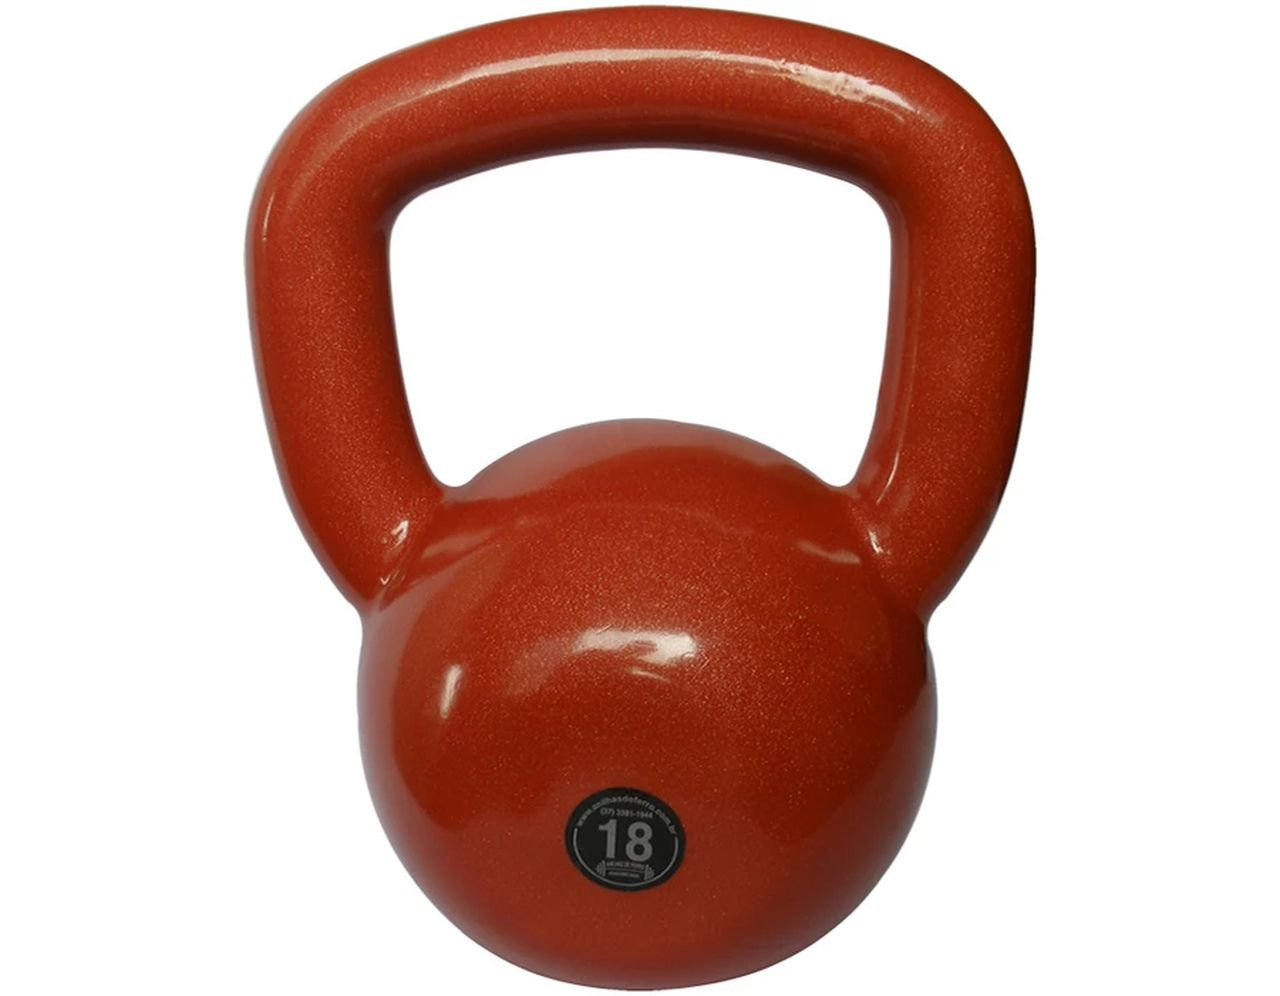 Kettlebell Emborrachado Treinamento Funcional Fitness 18,0kg  - Panela de Ferro Fundido